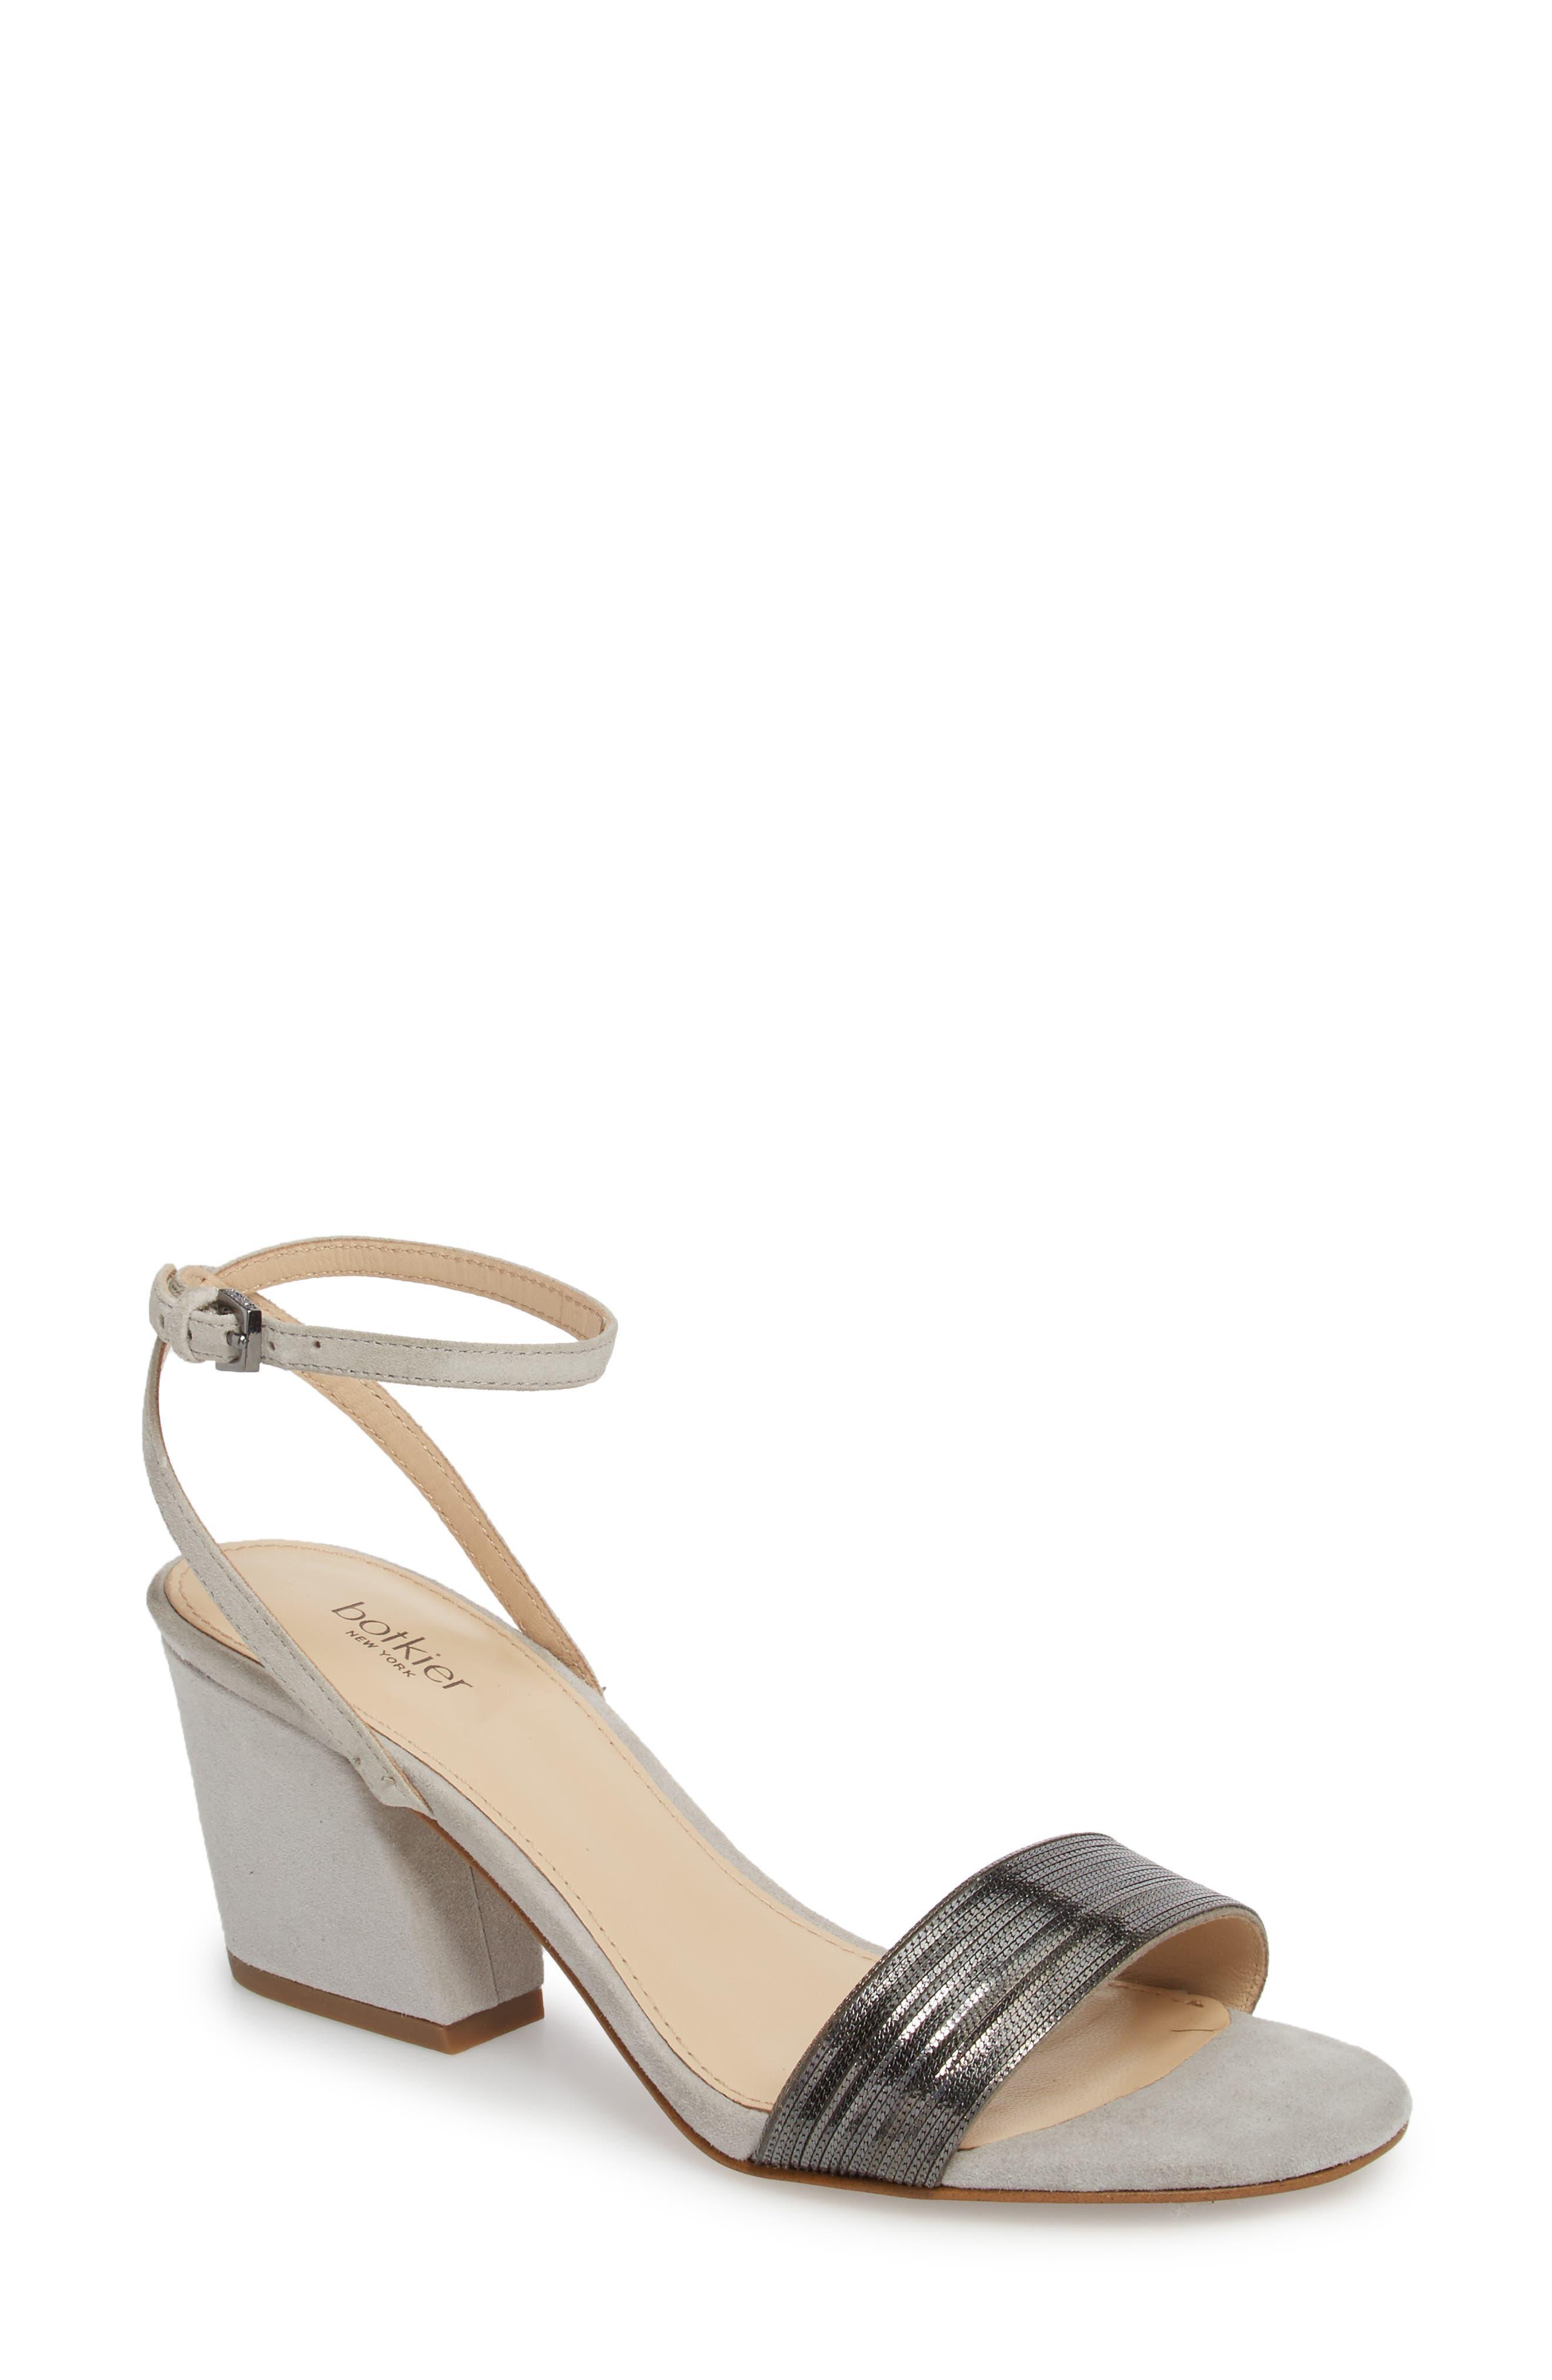 Persi Chain Wraparound Sandal,                         Main,                         color, 040